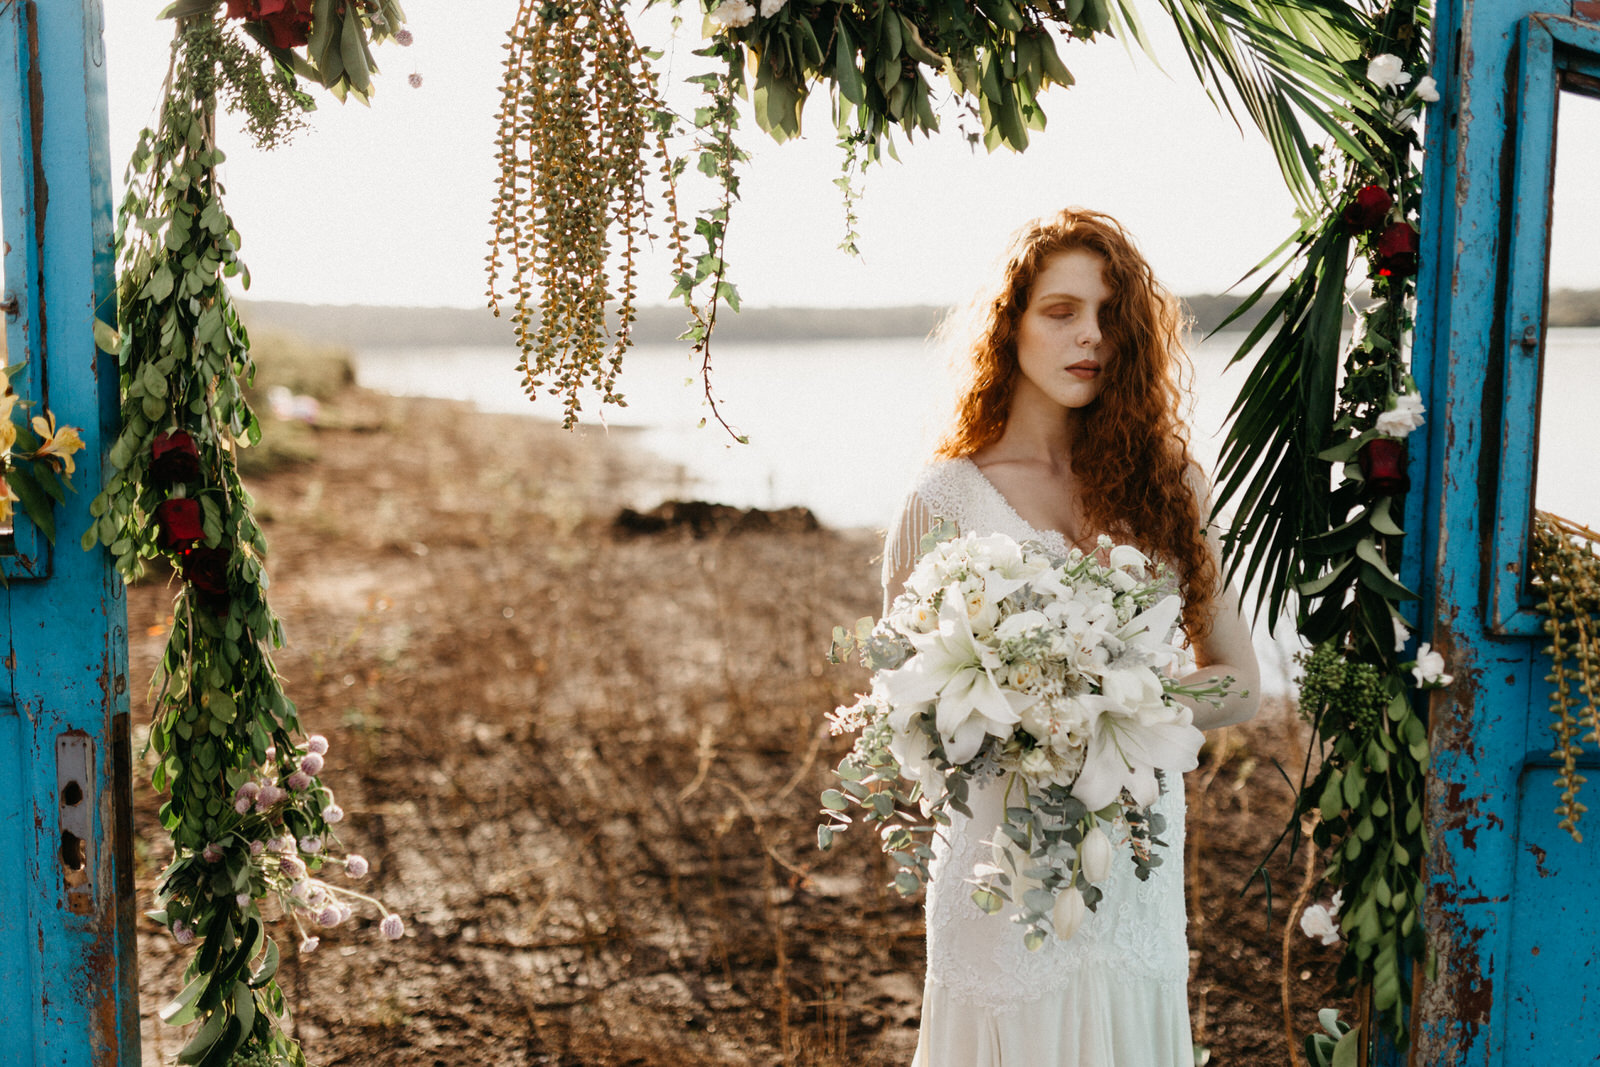 Céu_fotografia_casamentos_goiás_brasil_folk_noivas_brides_alternativo (30).jpg